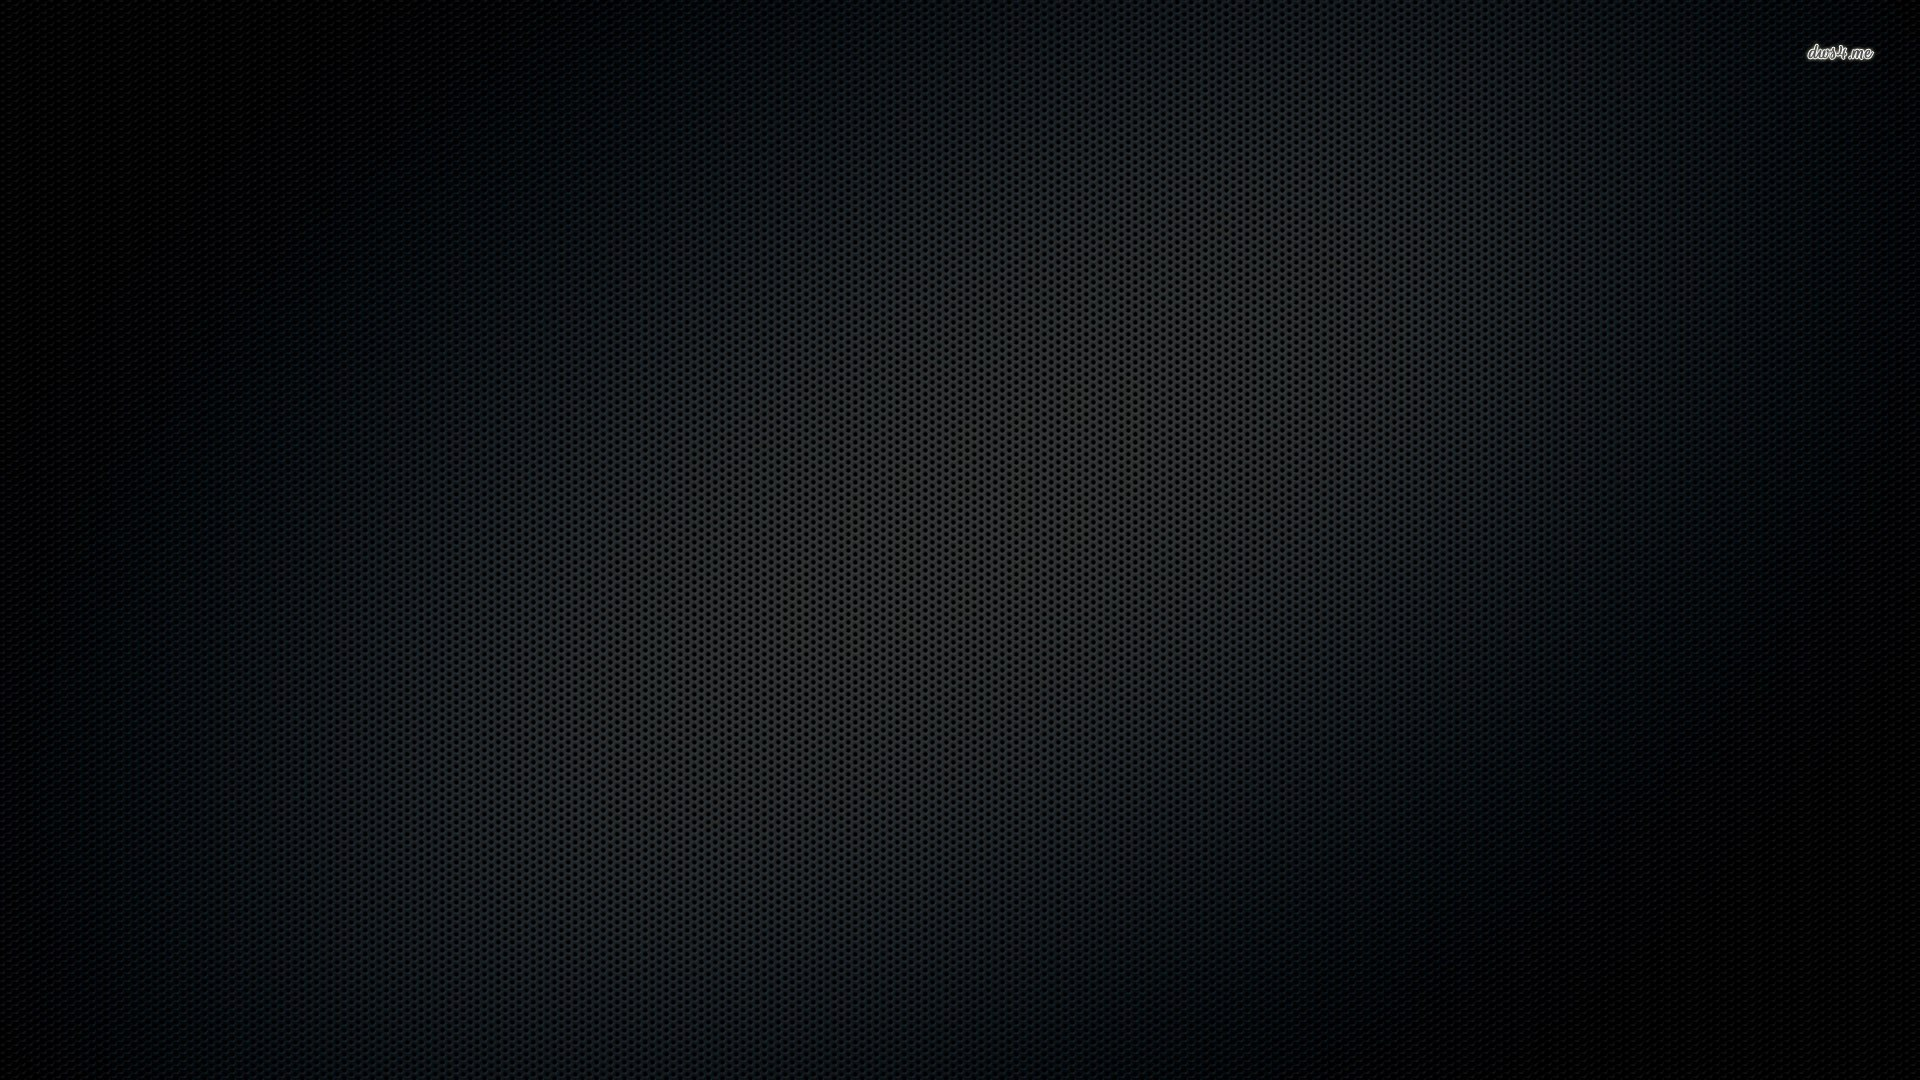 black texture wallpaper 1920x1080 - photo #7